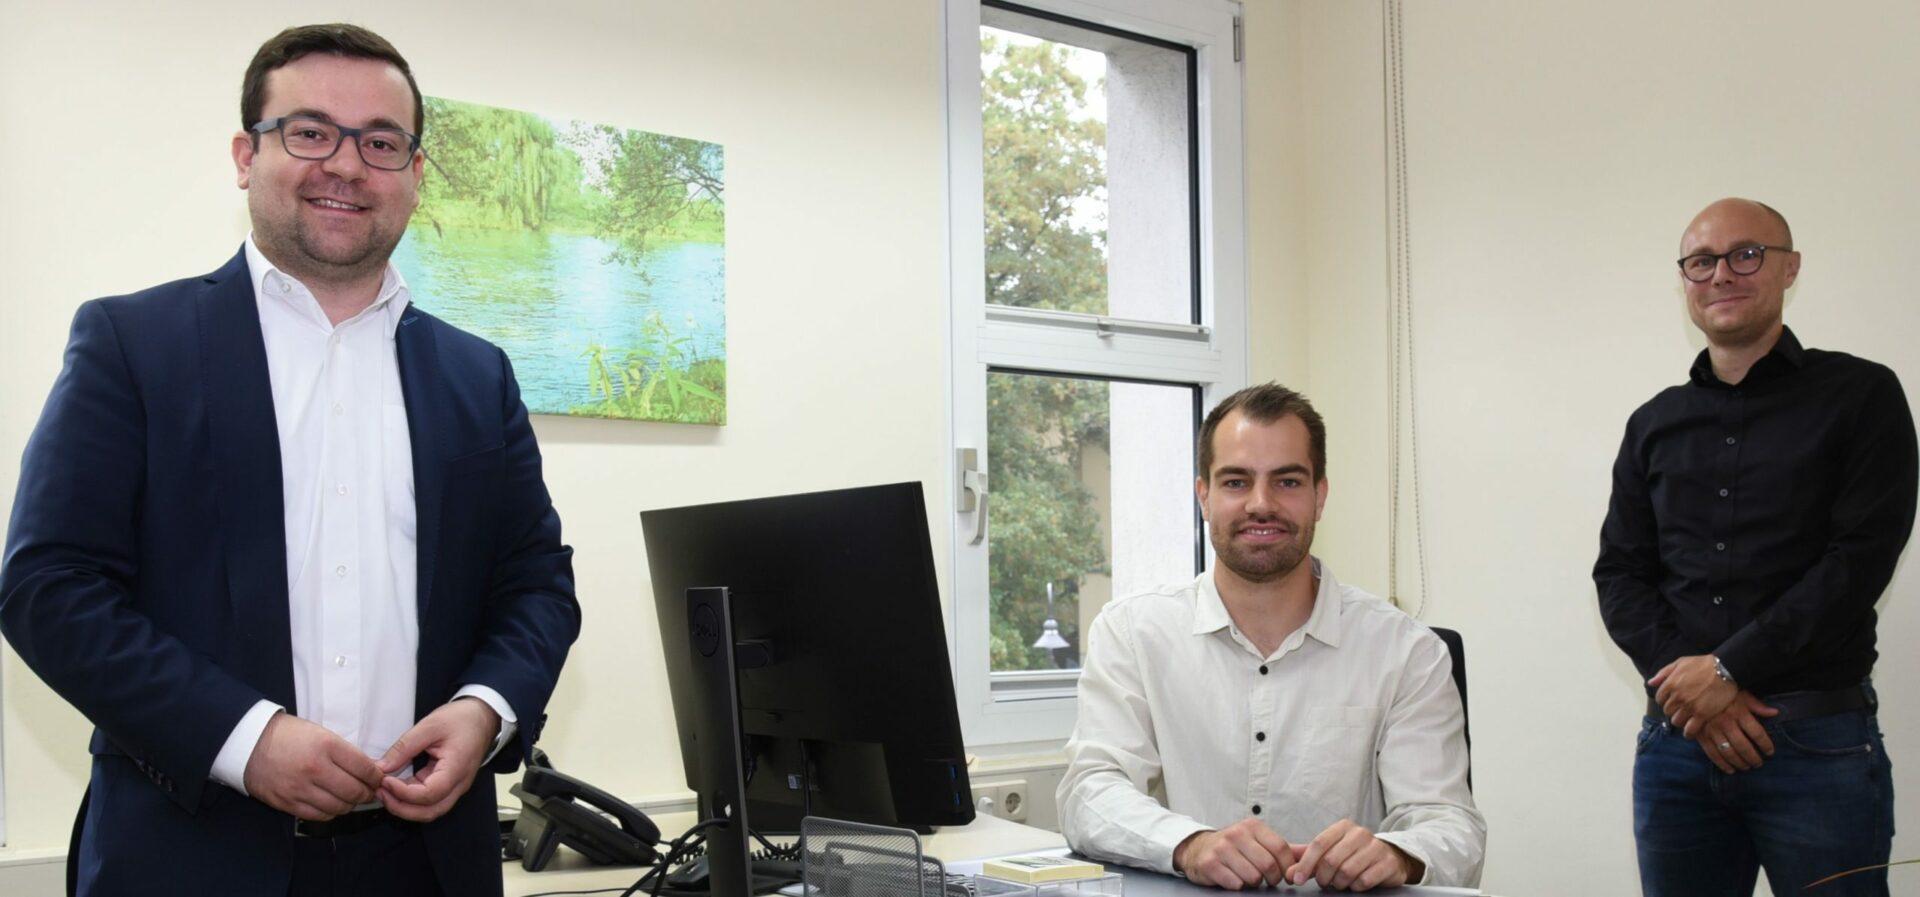 Neuer Umwelt- und Klimaschutzbeauftragter: Bürgermeister begrüßt Florian Hübner